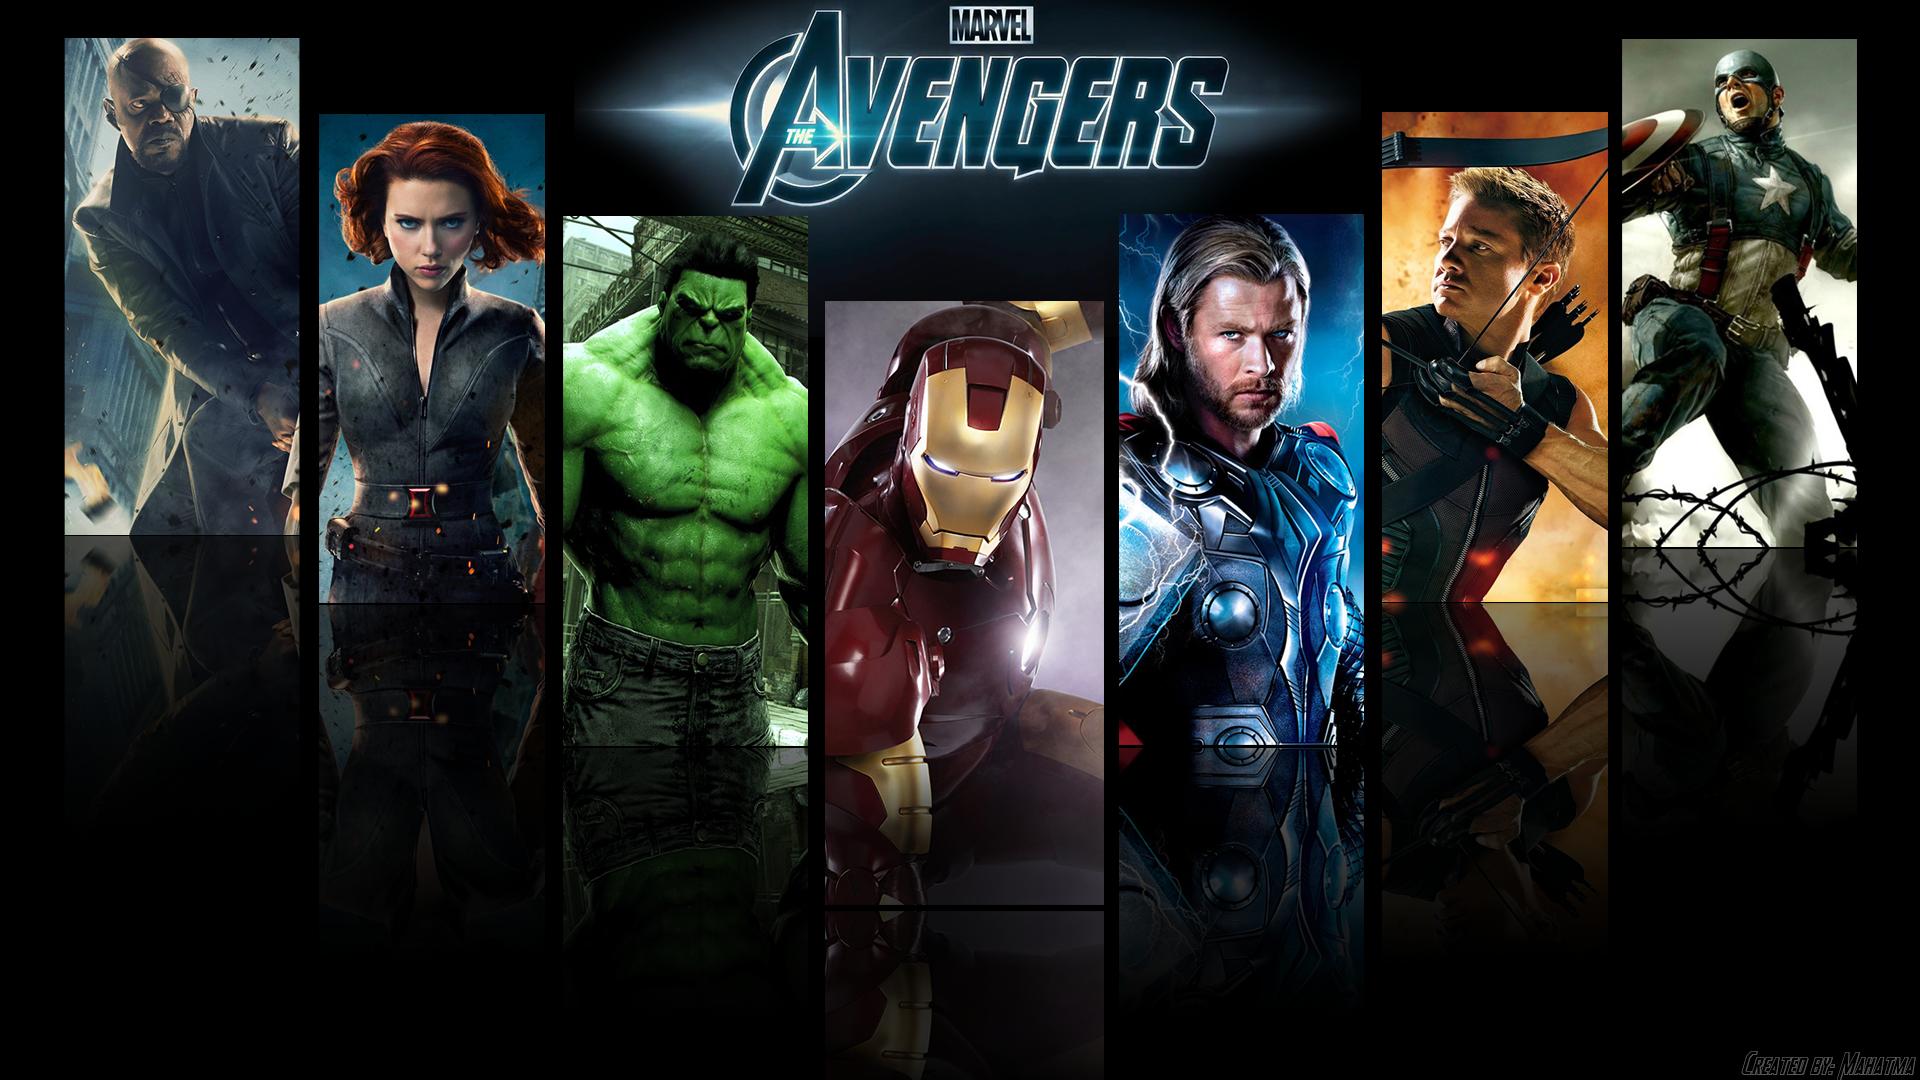 Black-Widow-Captain-America-The-Winter-Soldier-HD-desktop-wallpaper-wpc9002957